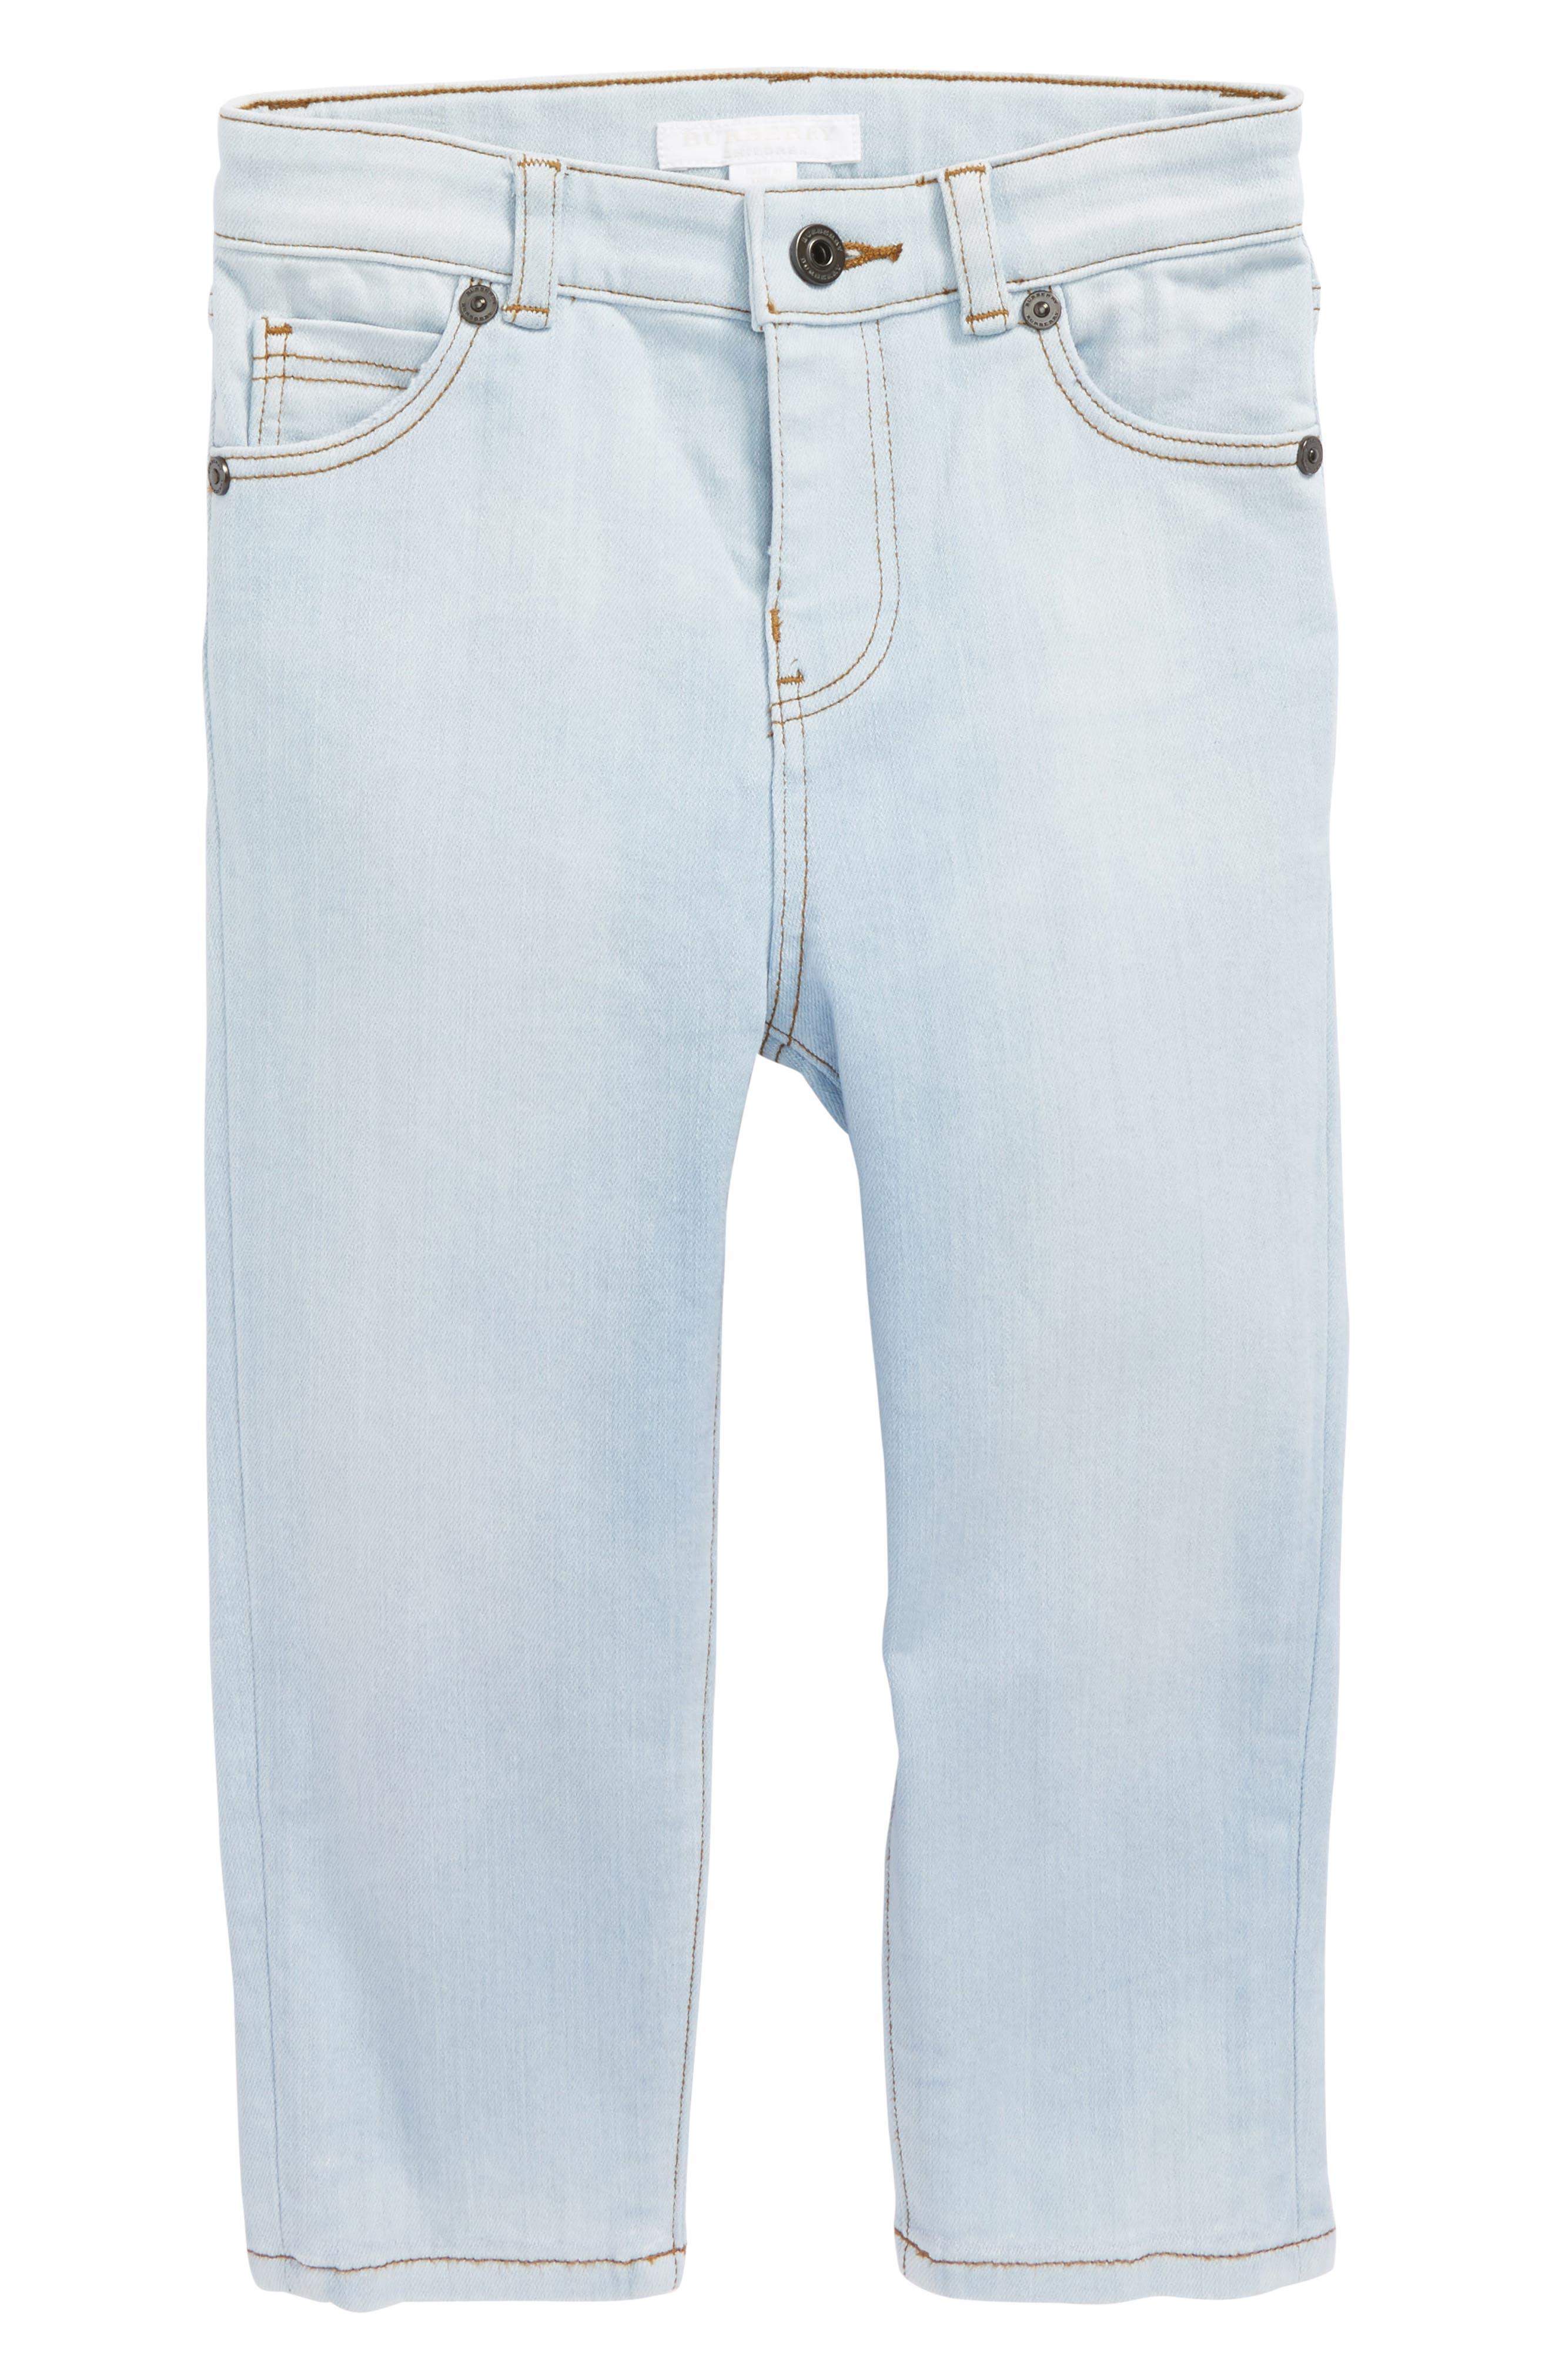 Skinny Jeans,                         Main,                         color, Light Blue